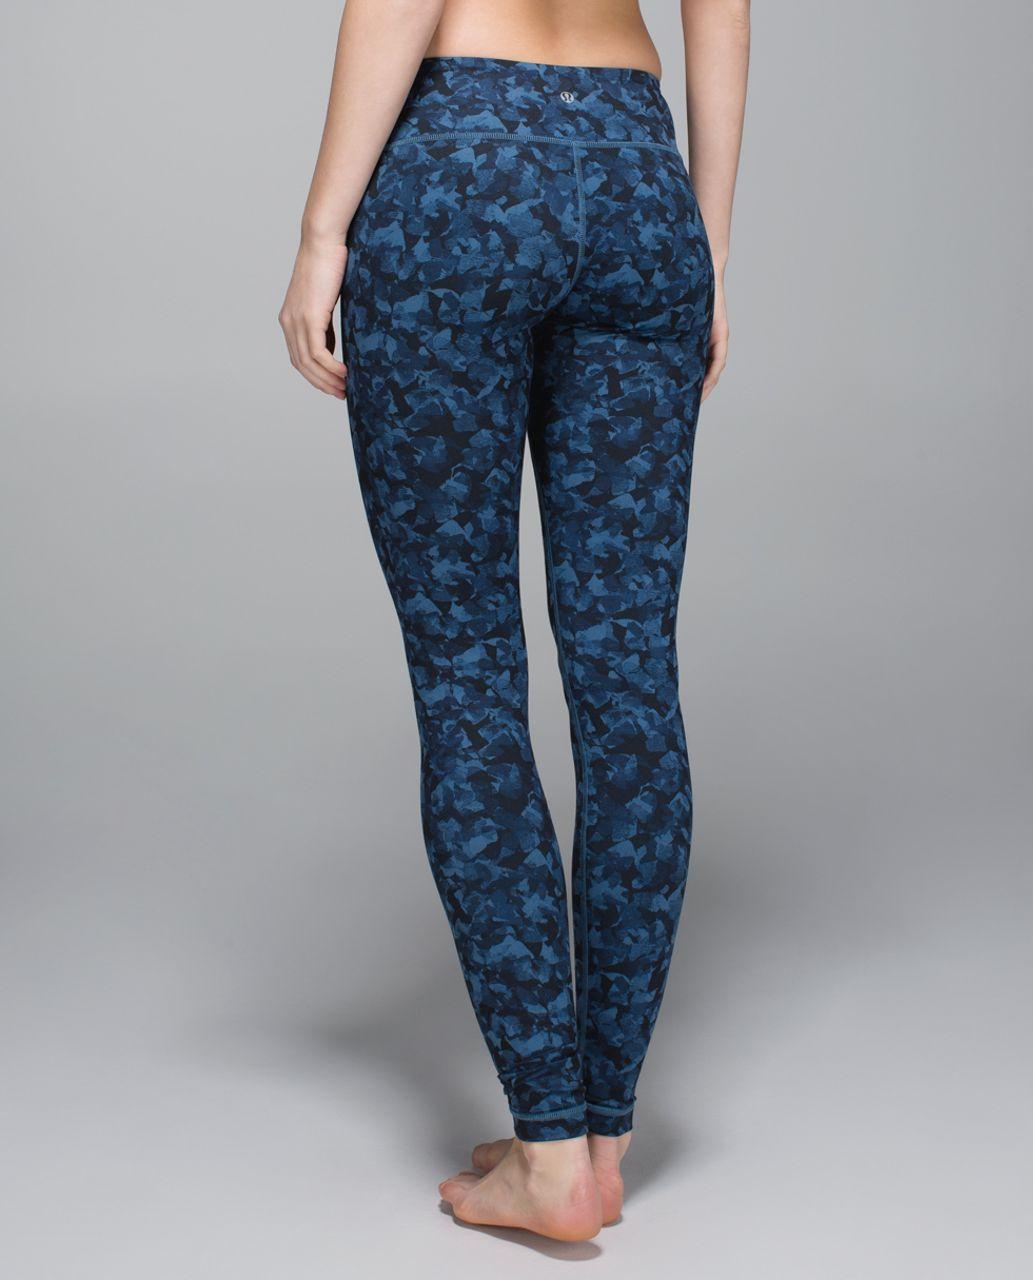 Lululemon Wunder Under Pant *Full-On Luon - Mystic Jungle Hawk Blue Harbor Blue / Hawk Blue